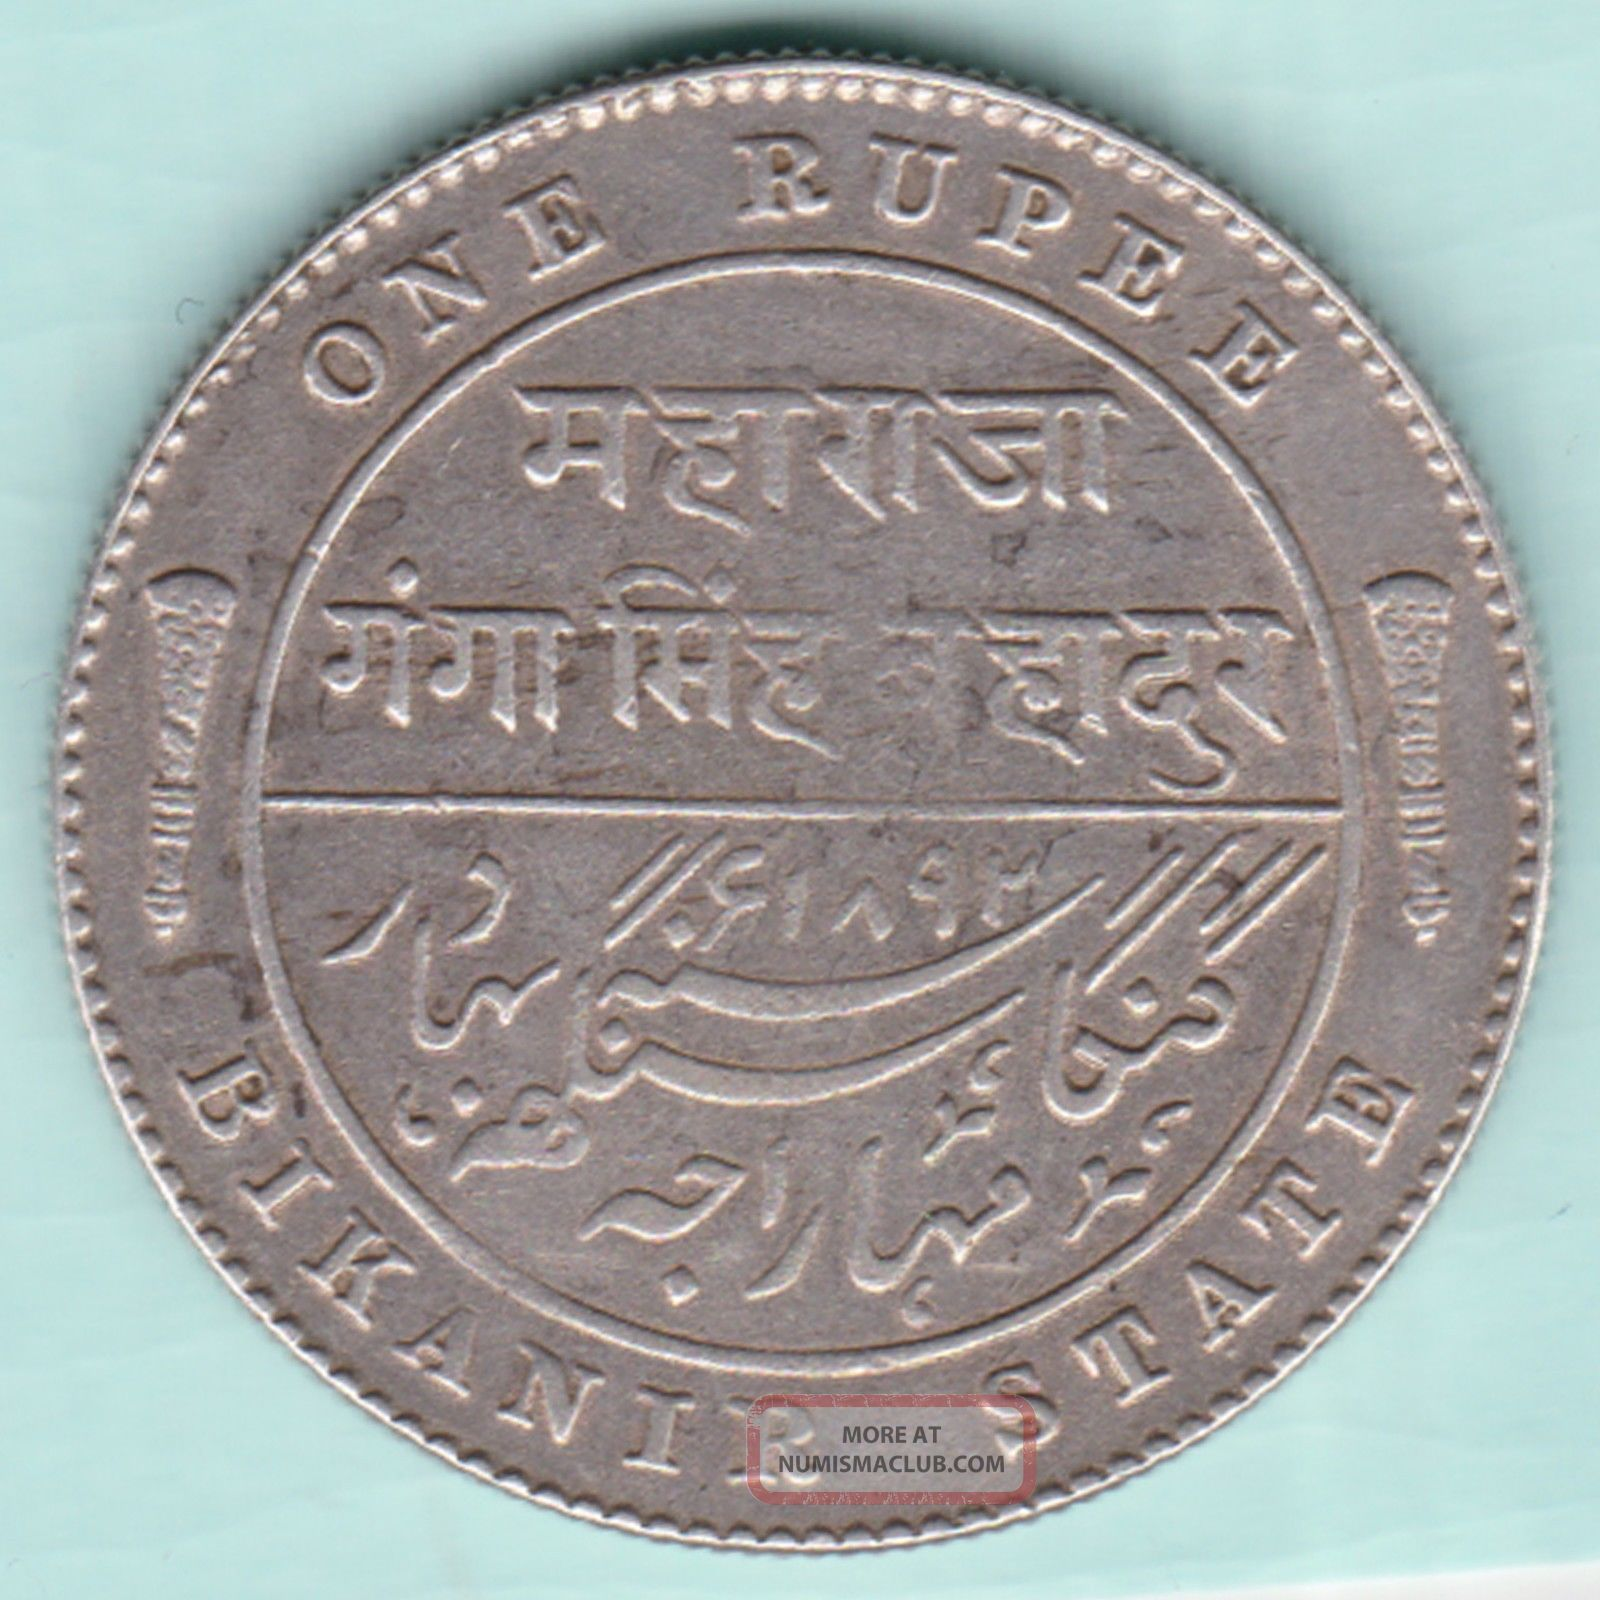 Bikanir State - 1892 - Victoria Queen - One Rupee - Rarest Silver Coin India photo